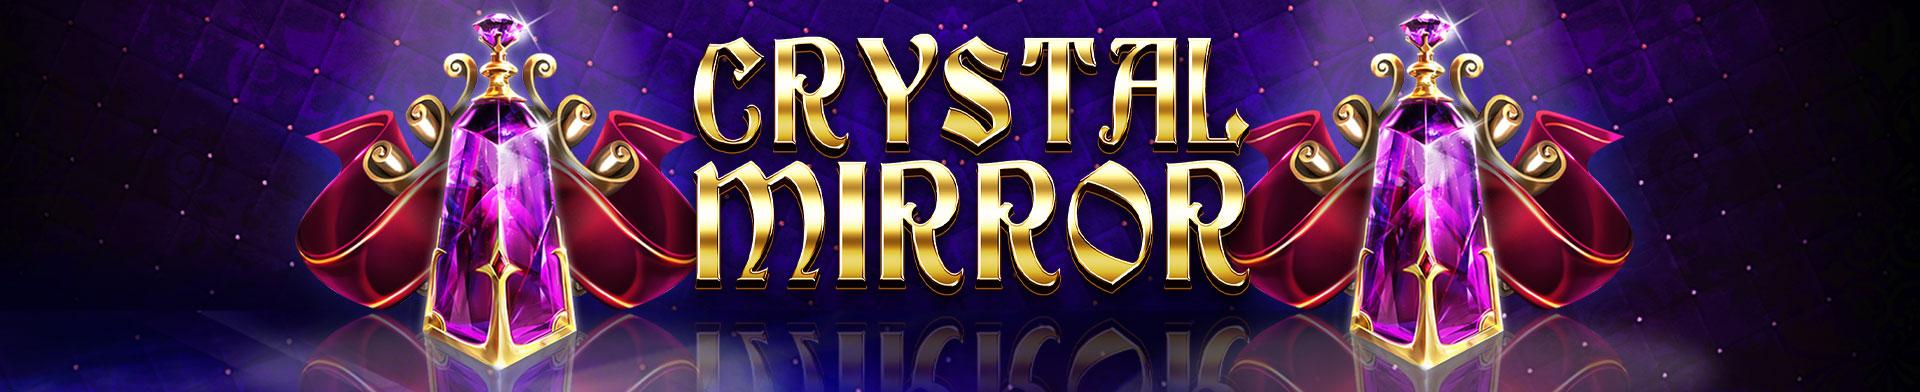 Crystal Mirror Banner